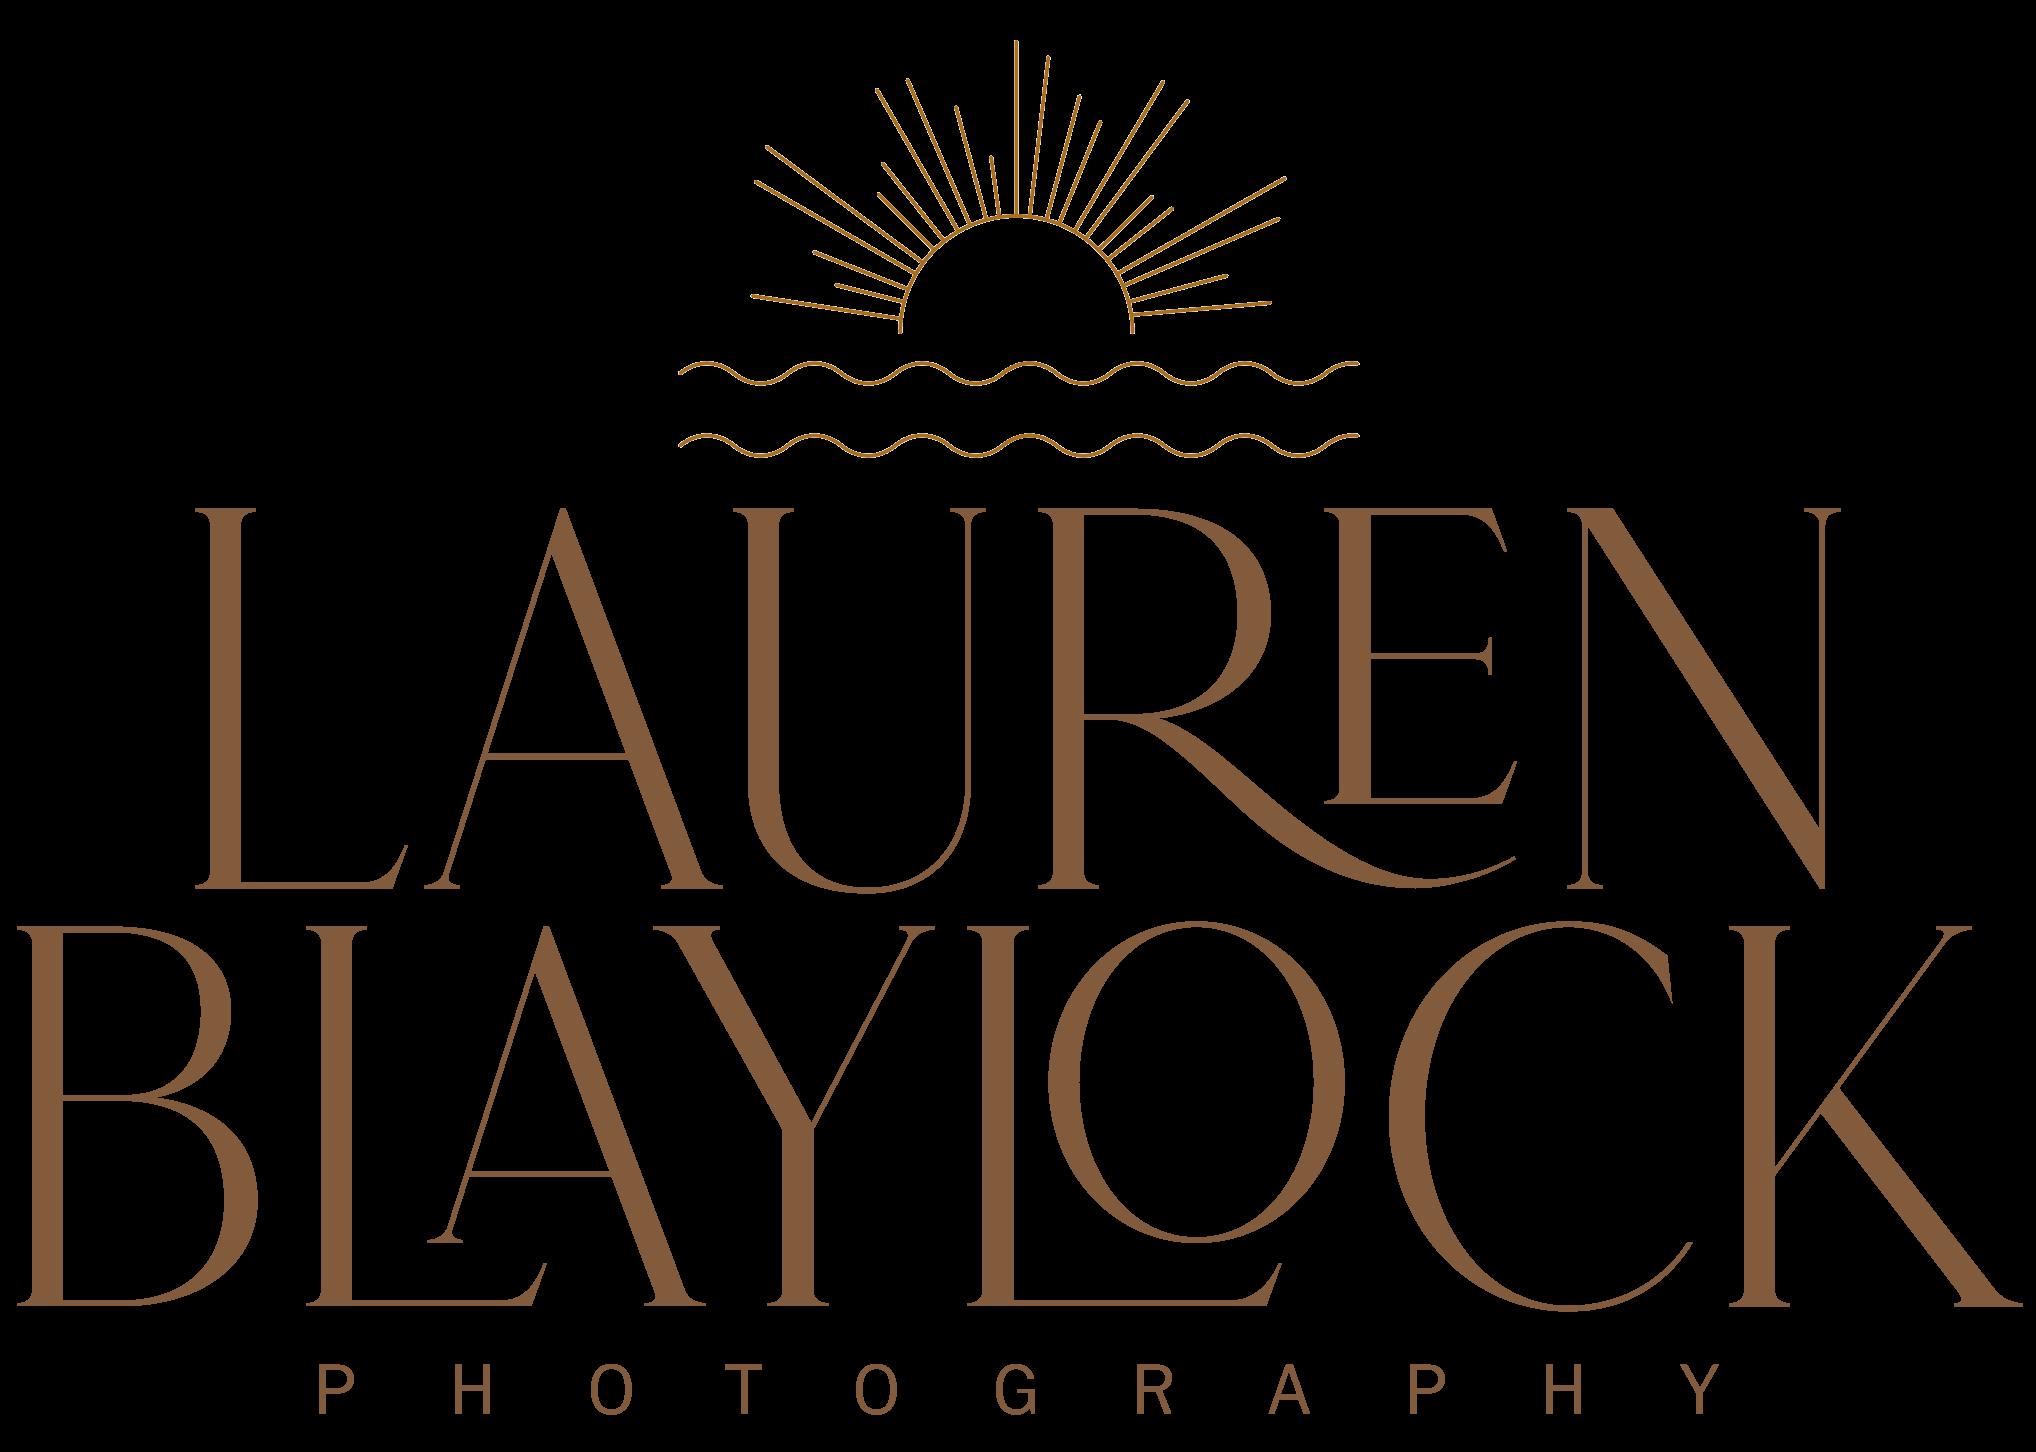 LB Photography, LLC